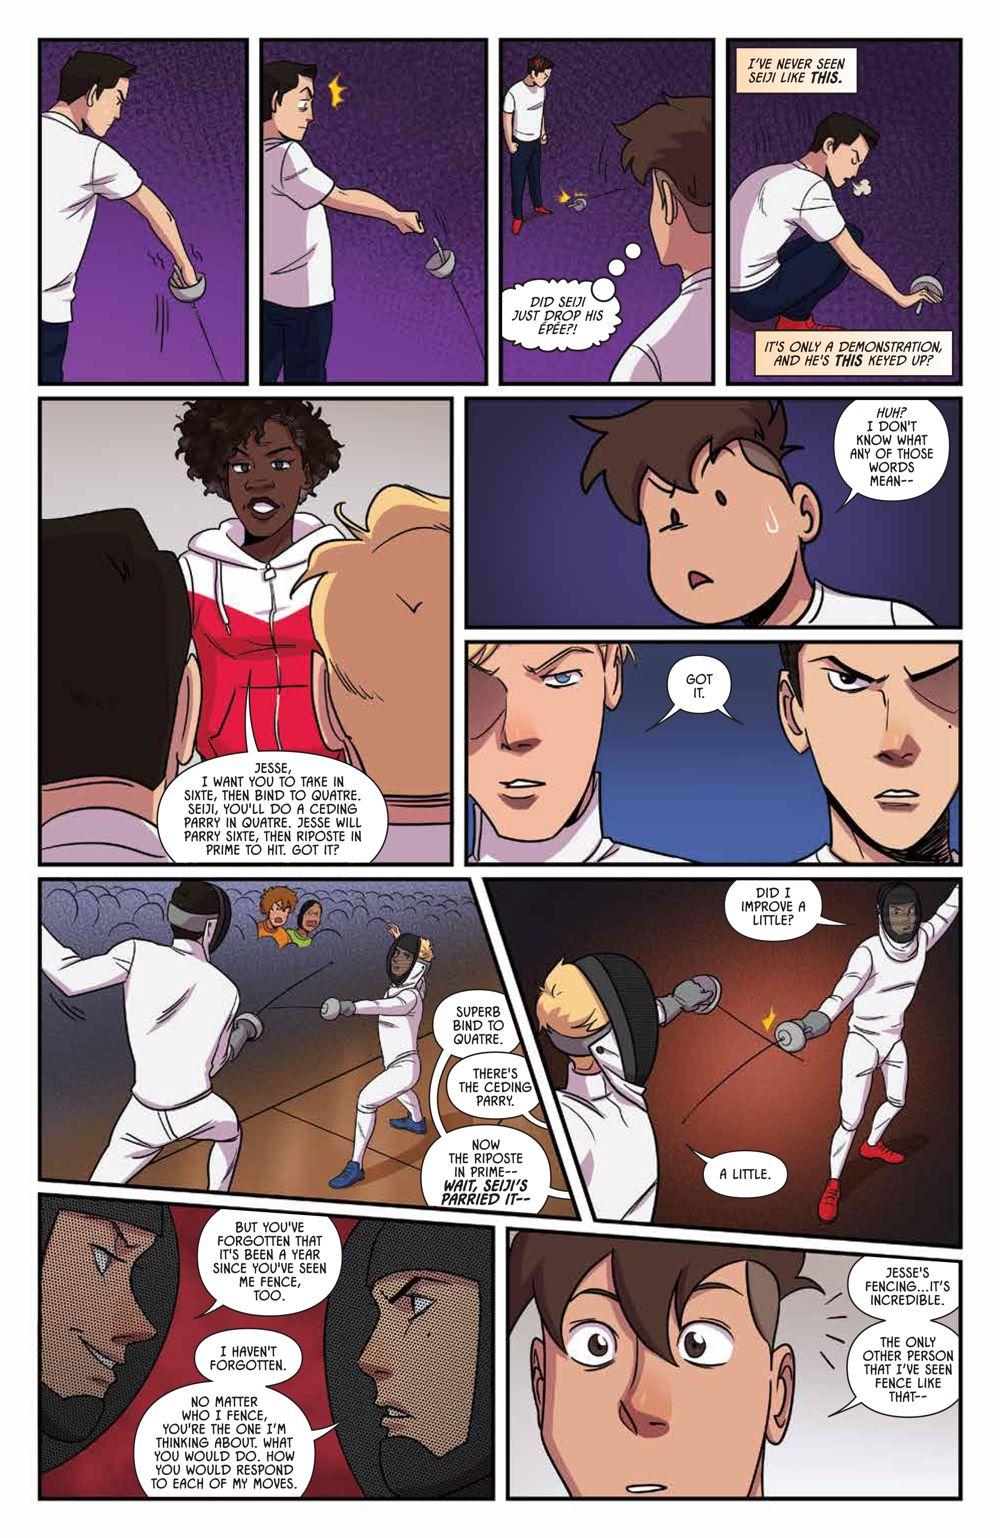 Fence_OGN_Rivals_SC_PRESS_13-1 ComicList Previews: FENCE RIVALS GN